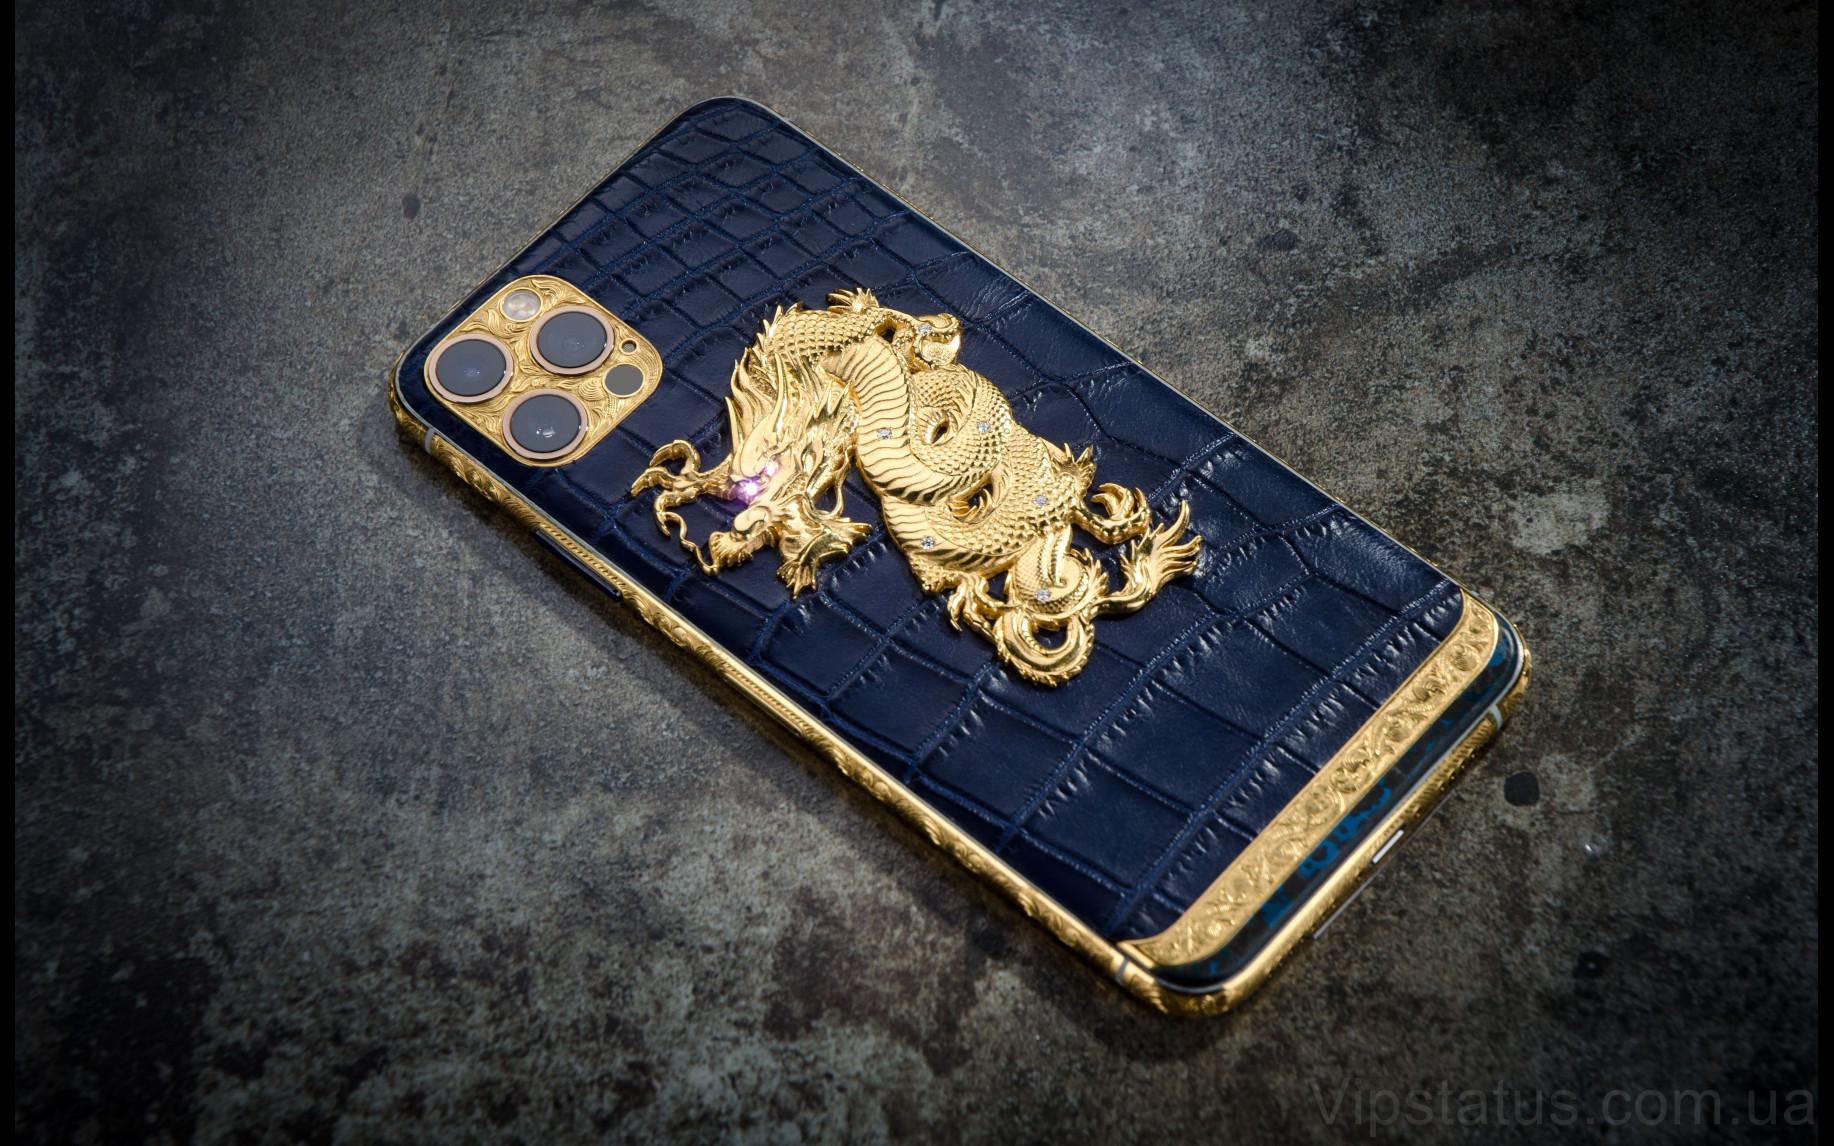 Elite Oriental Dragon IPHONE 12 PRO MAX 512 GB Oriental Dragon IPHONE 12 PRO MAX 512 GB image 5